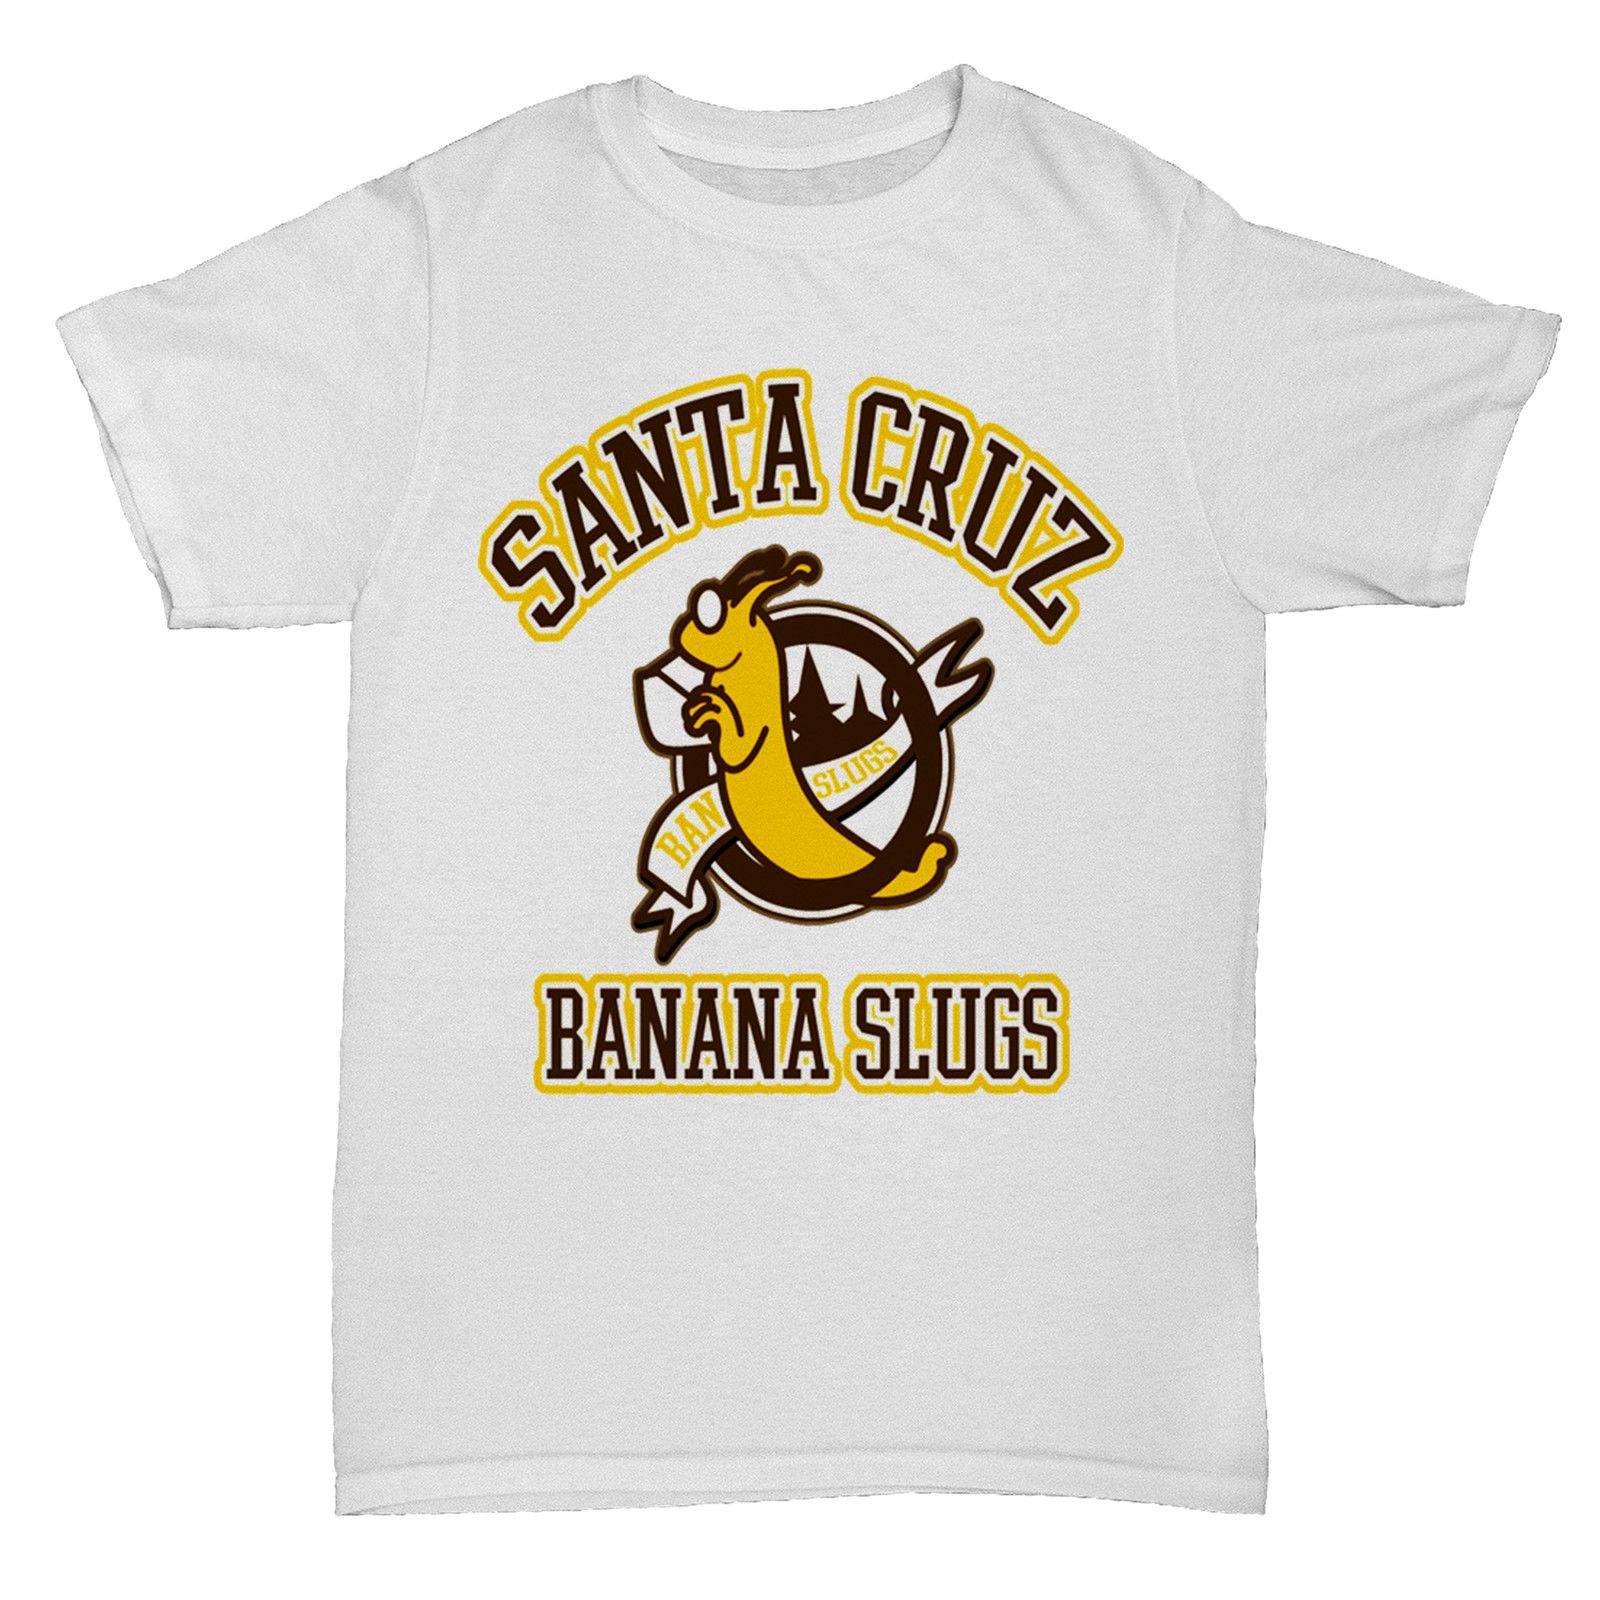 banana-slugs-inspired-pulp-fiction-cult-movie-film-font-b-tarantino-b-font-t-shirt-cartoon-t-shirt-men-unisex-new-fashion-tshirt-loose-size